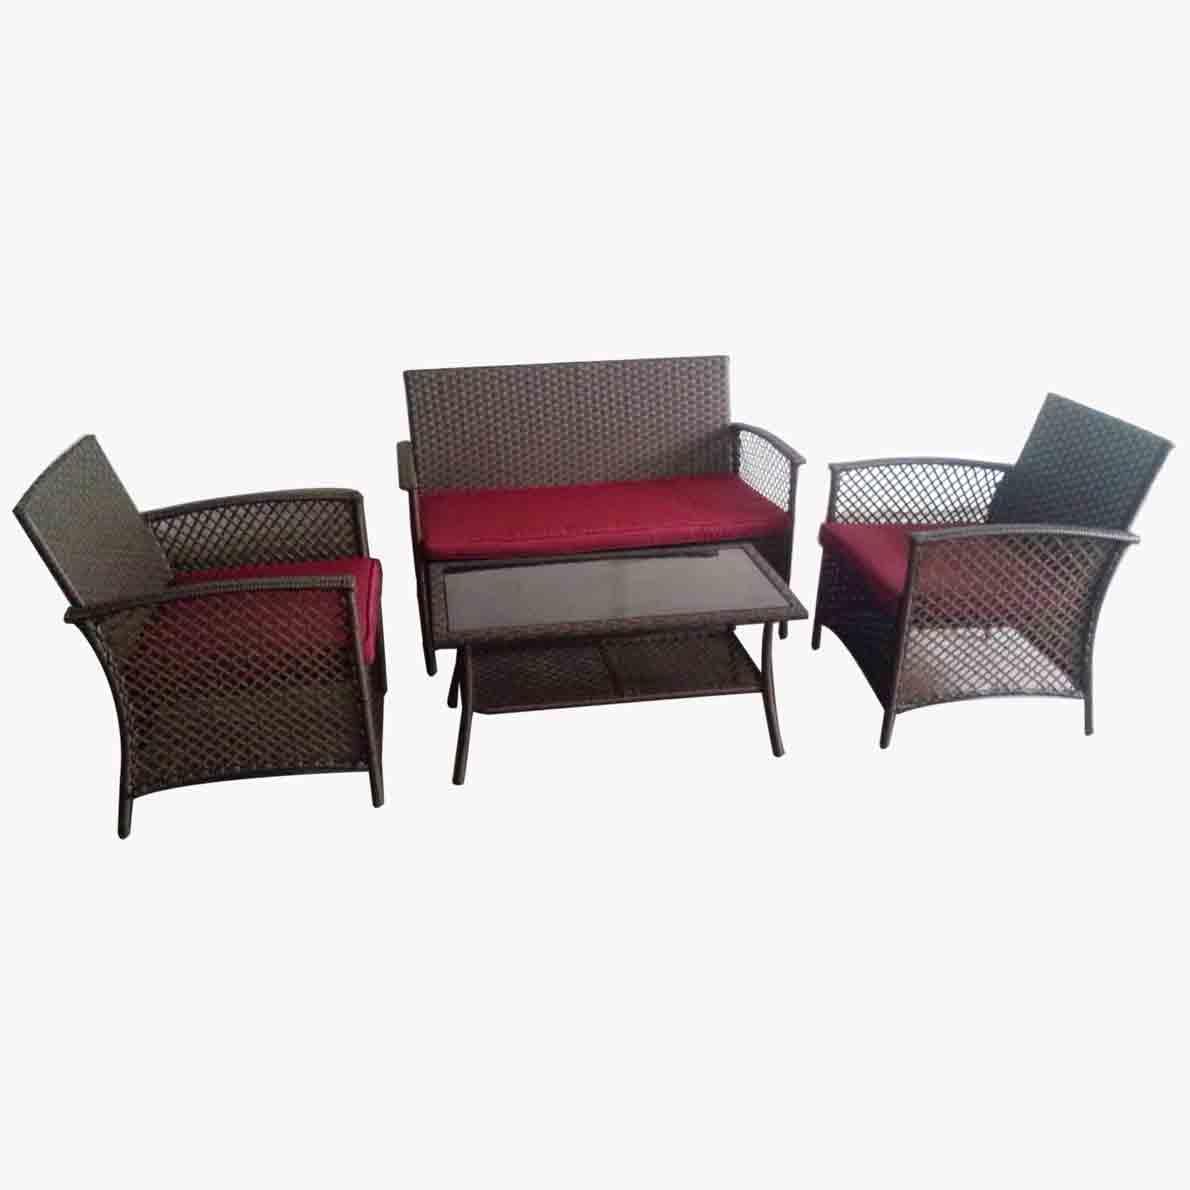 China wholesale Outdoor Armless Chairs - JJS3187W Steel frame rattan 4pcs sofa set – Jin-jiang Industry